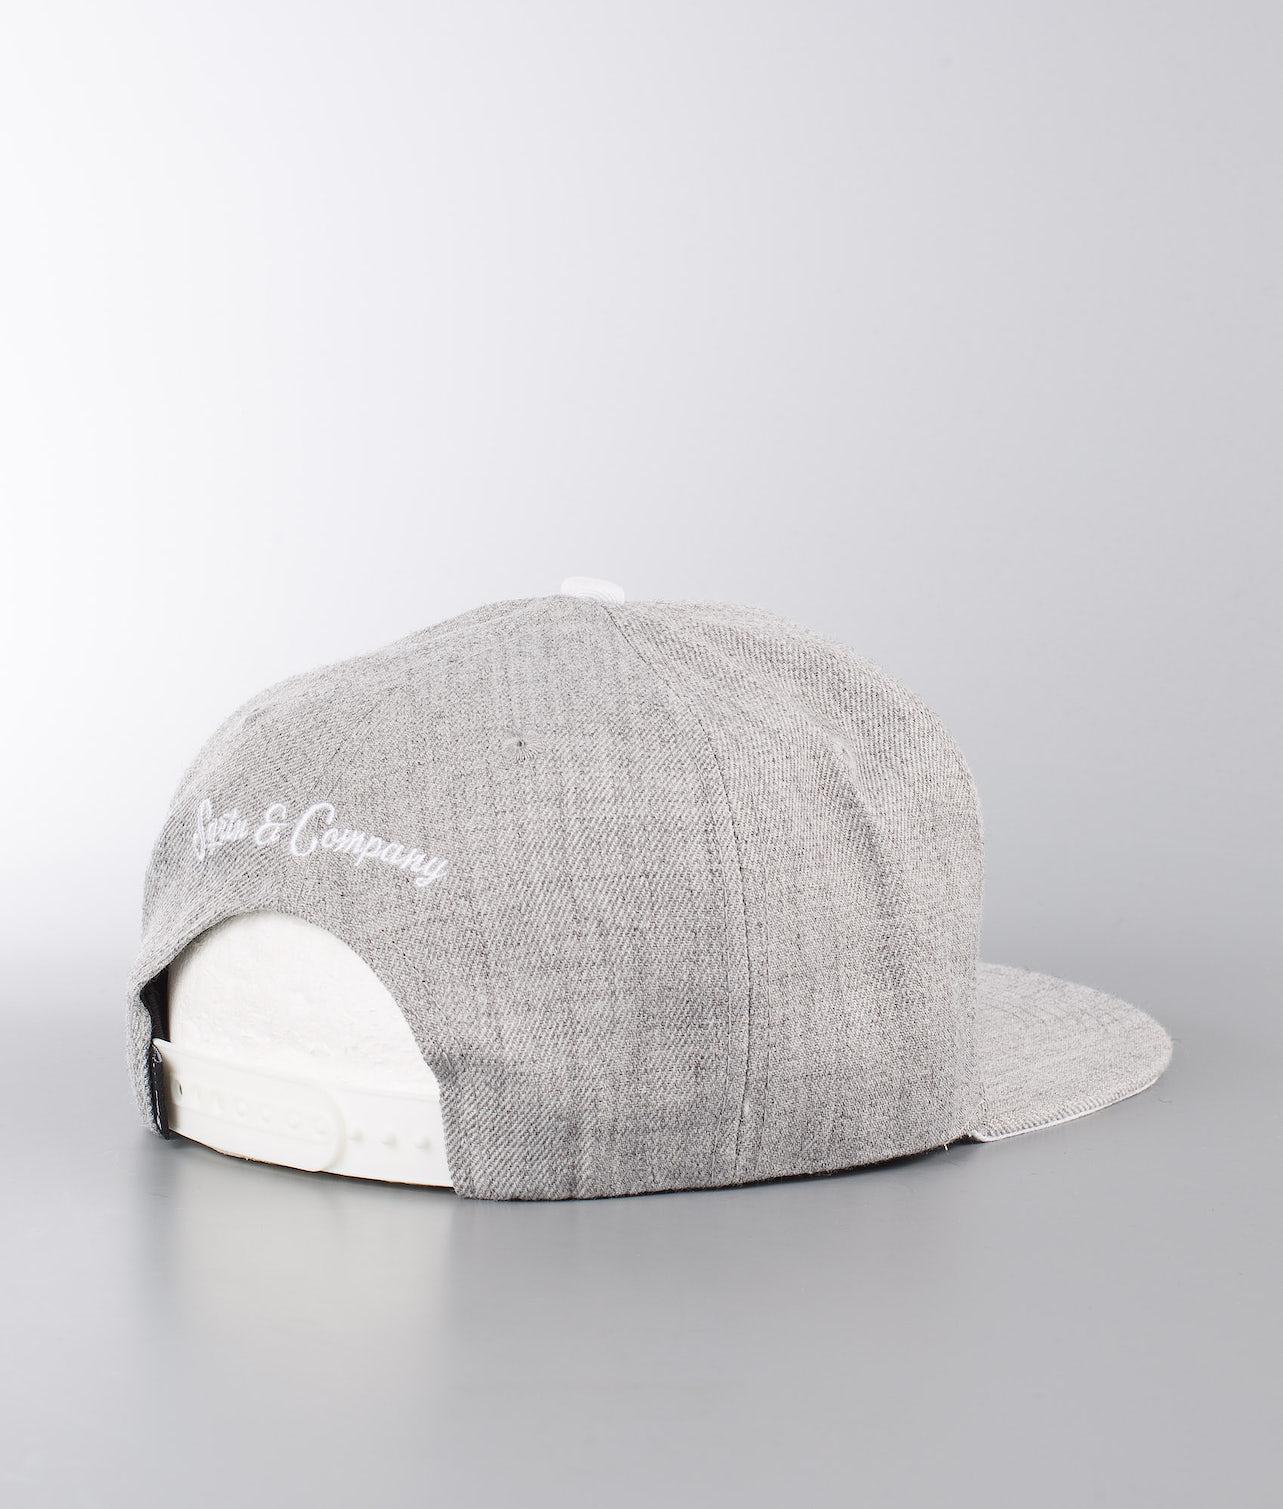 SQRTN Great Norrland Caps Grey